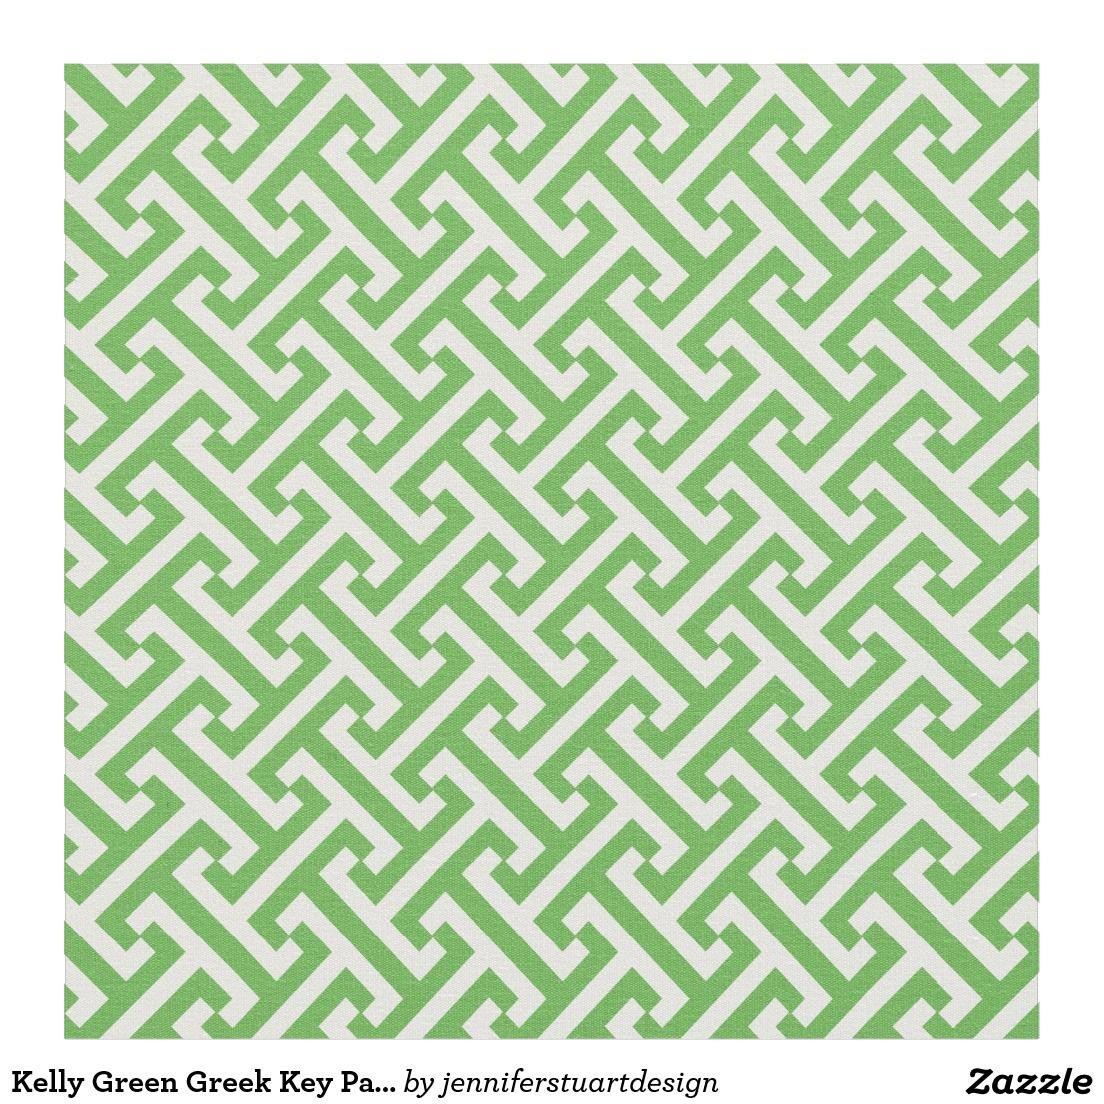 Kelly Green Greek Key Pattern Fabric